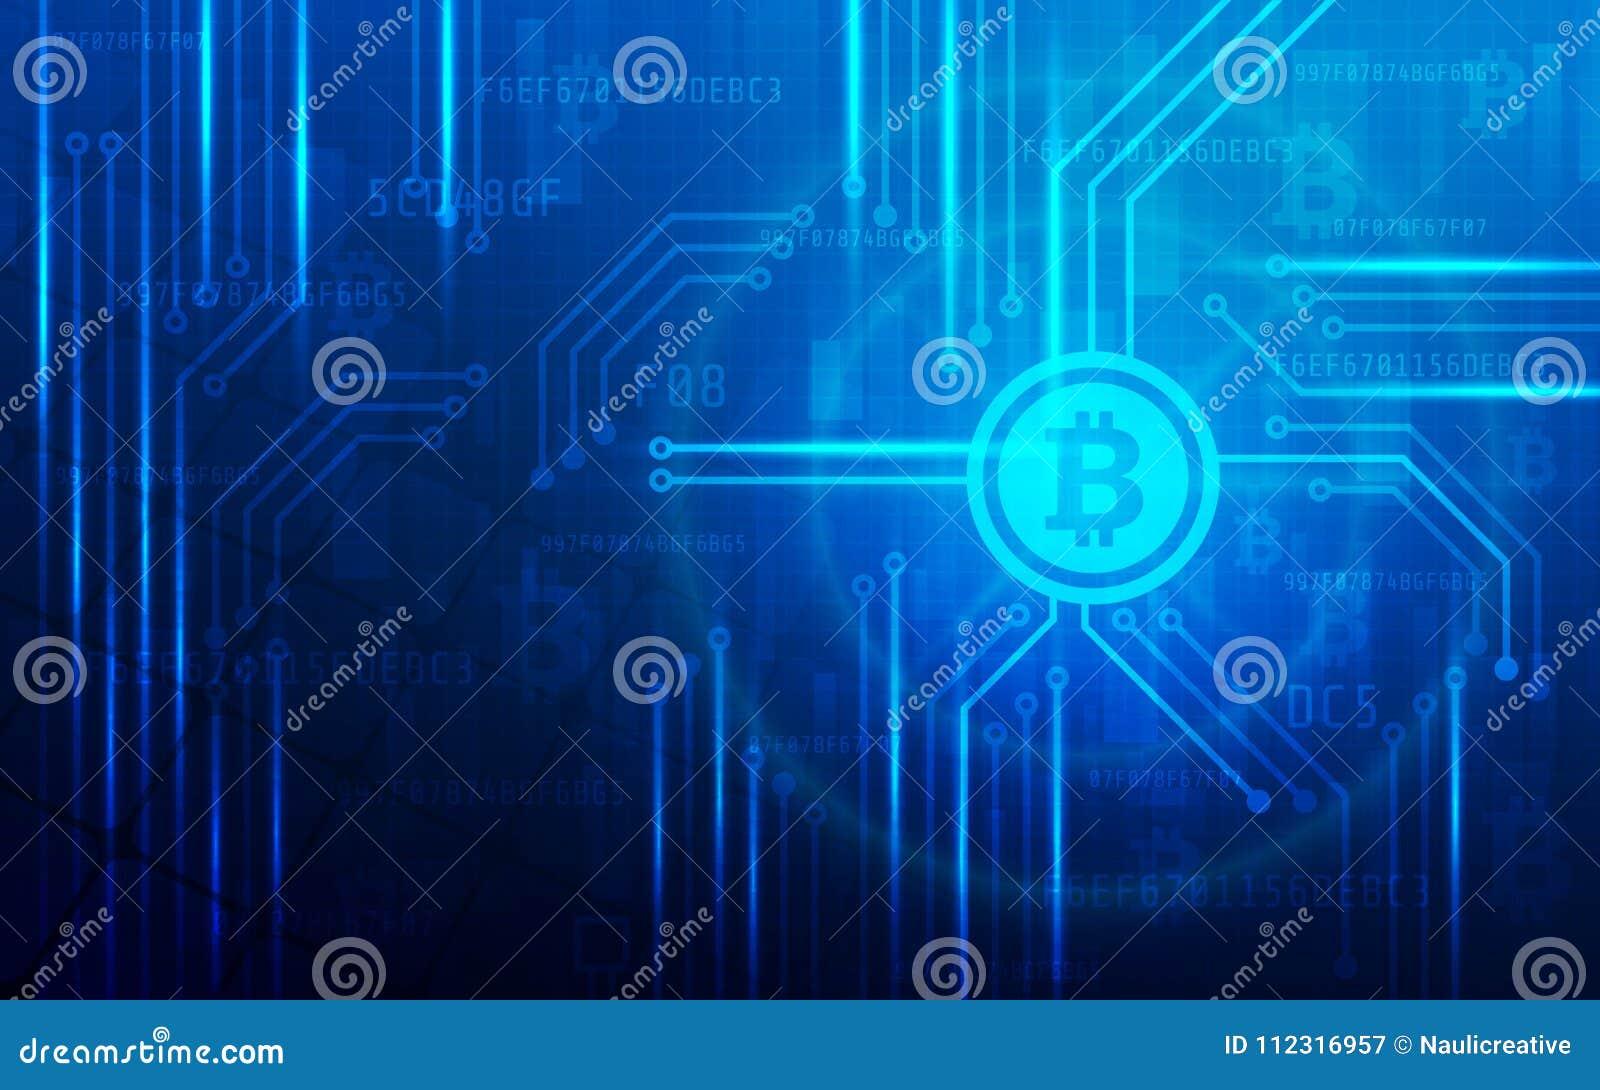 ultra bitcoin gratuit